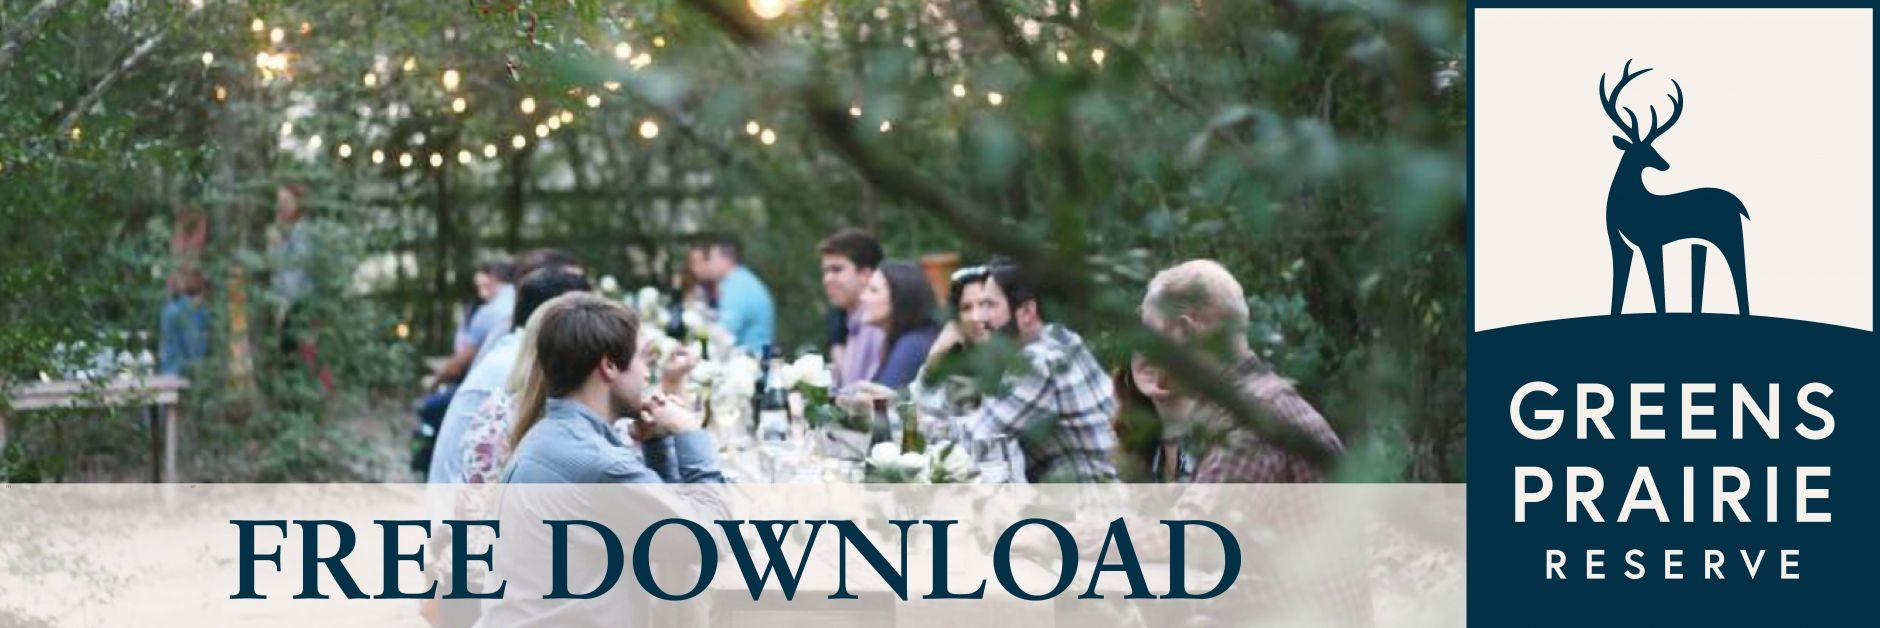 Free Download Link